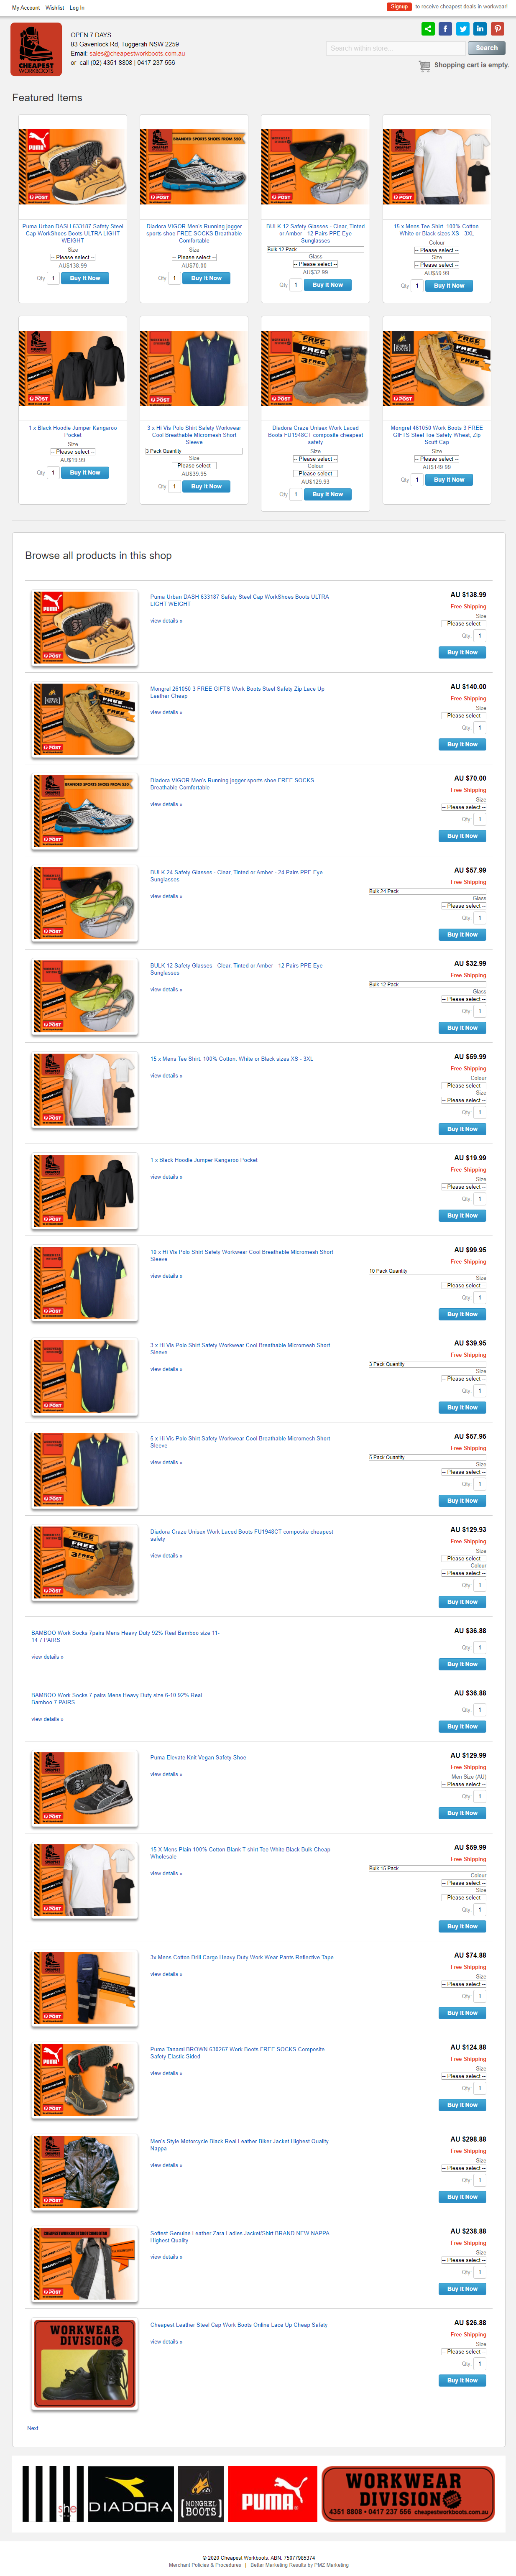 Cheapest Workboots :: PMZ Marketing Client